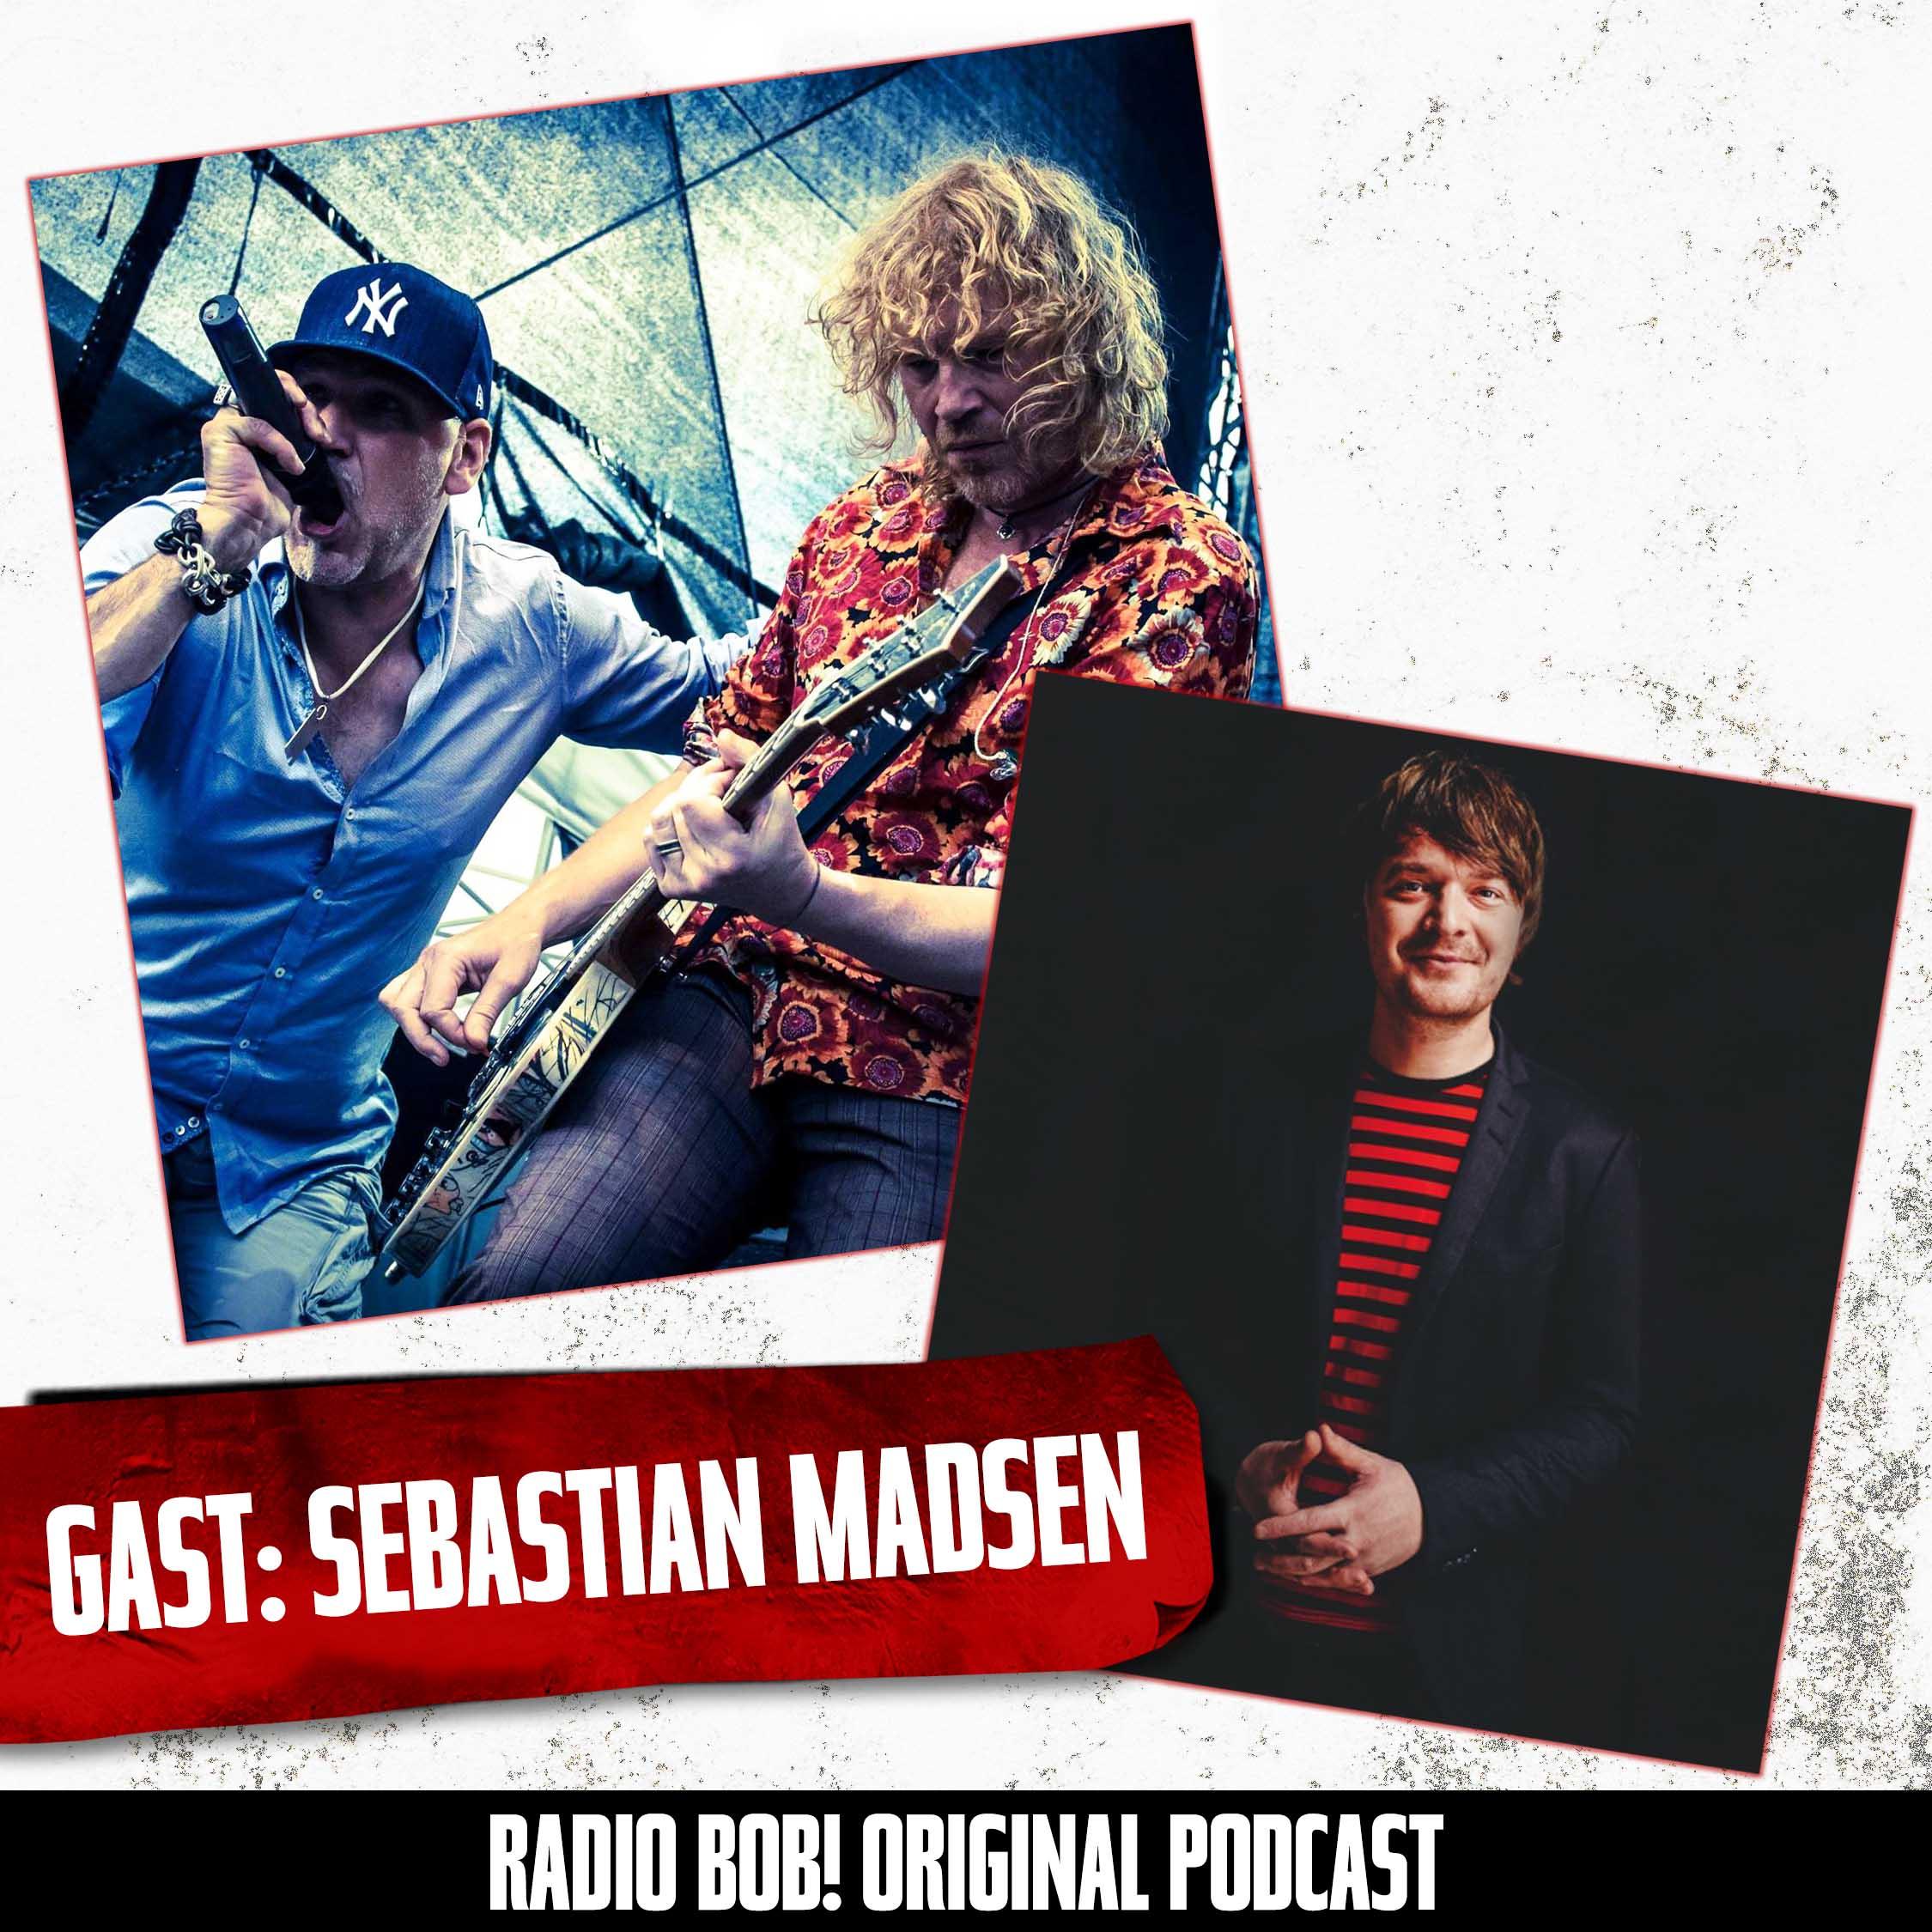 #16 - Sebastian Madsen